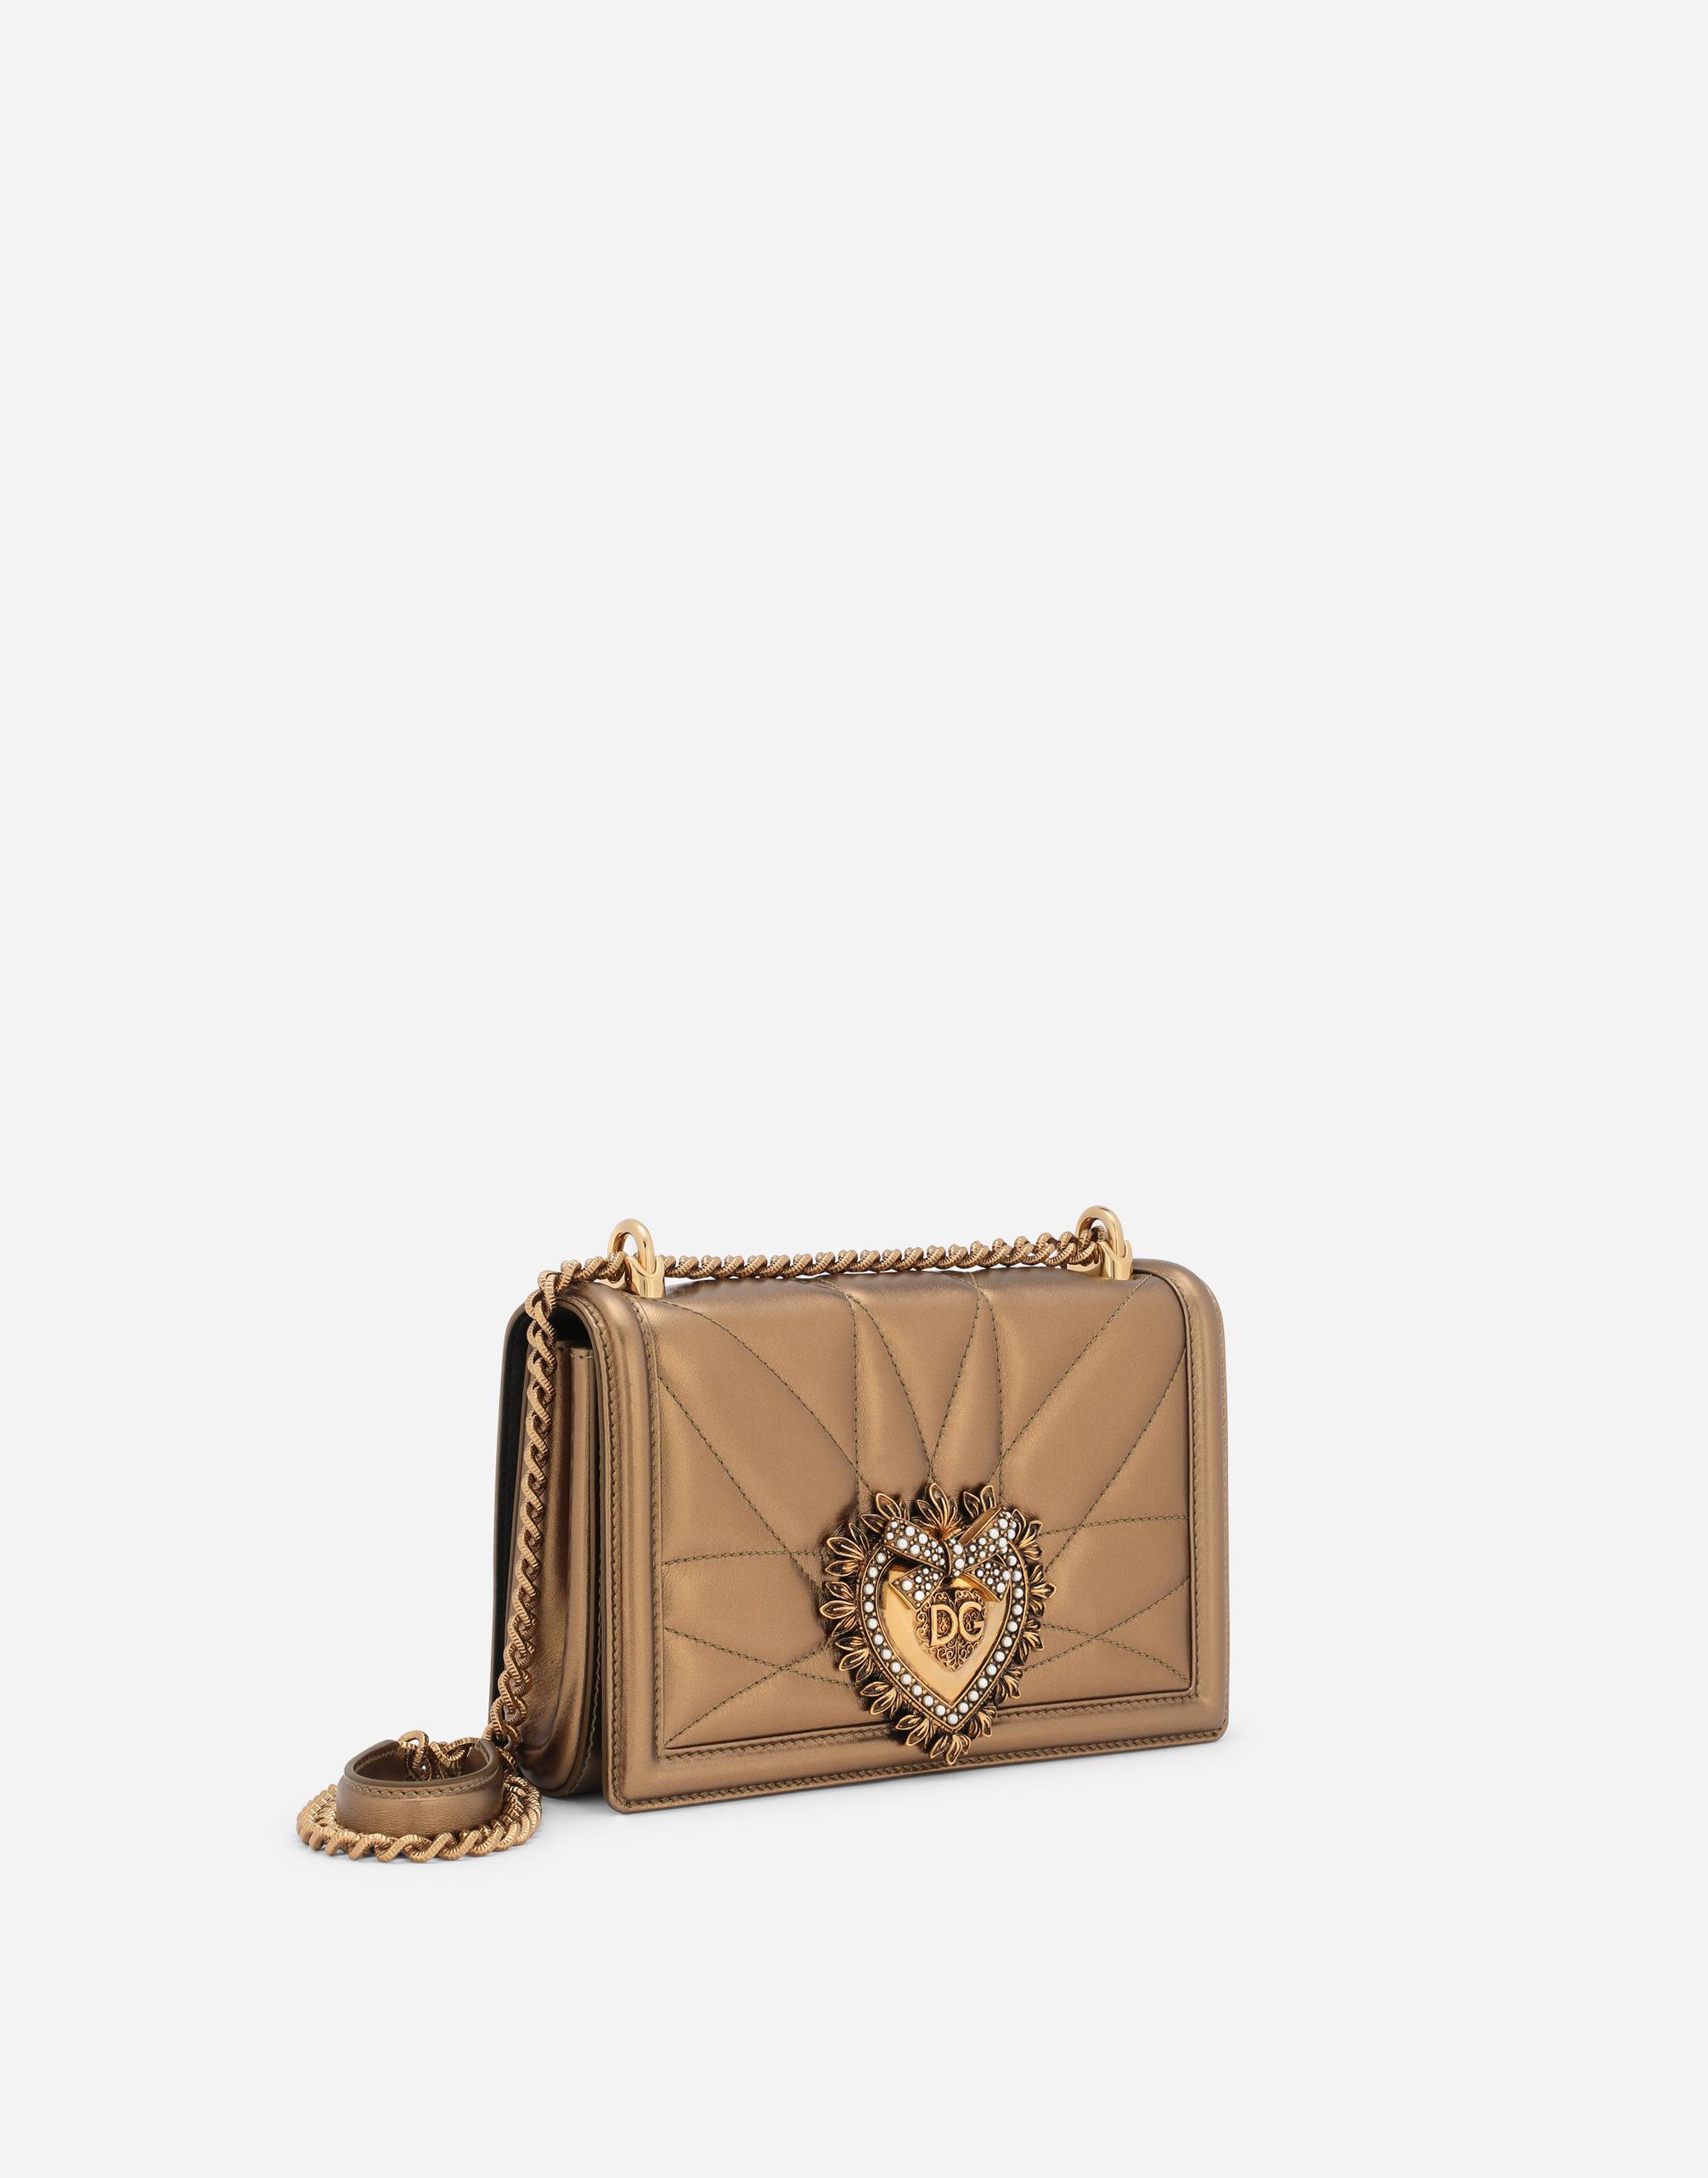 Dolce&Gabbana MEDIUM DEVOTION BAG IN QUILTED NAPPA MORDORÉ